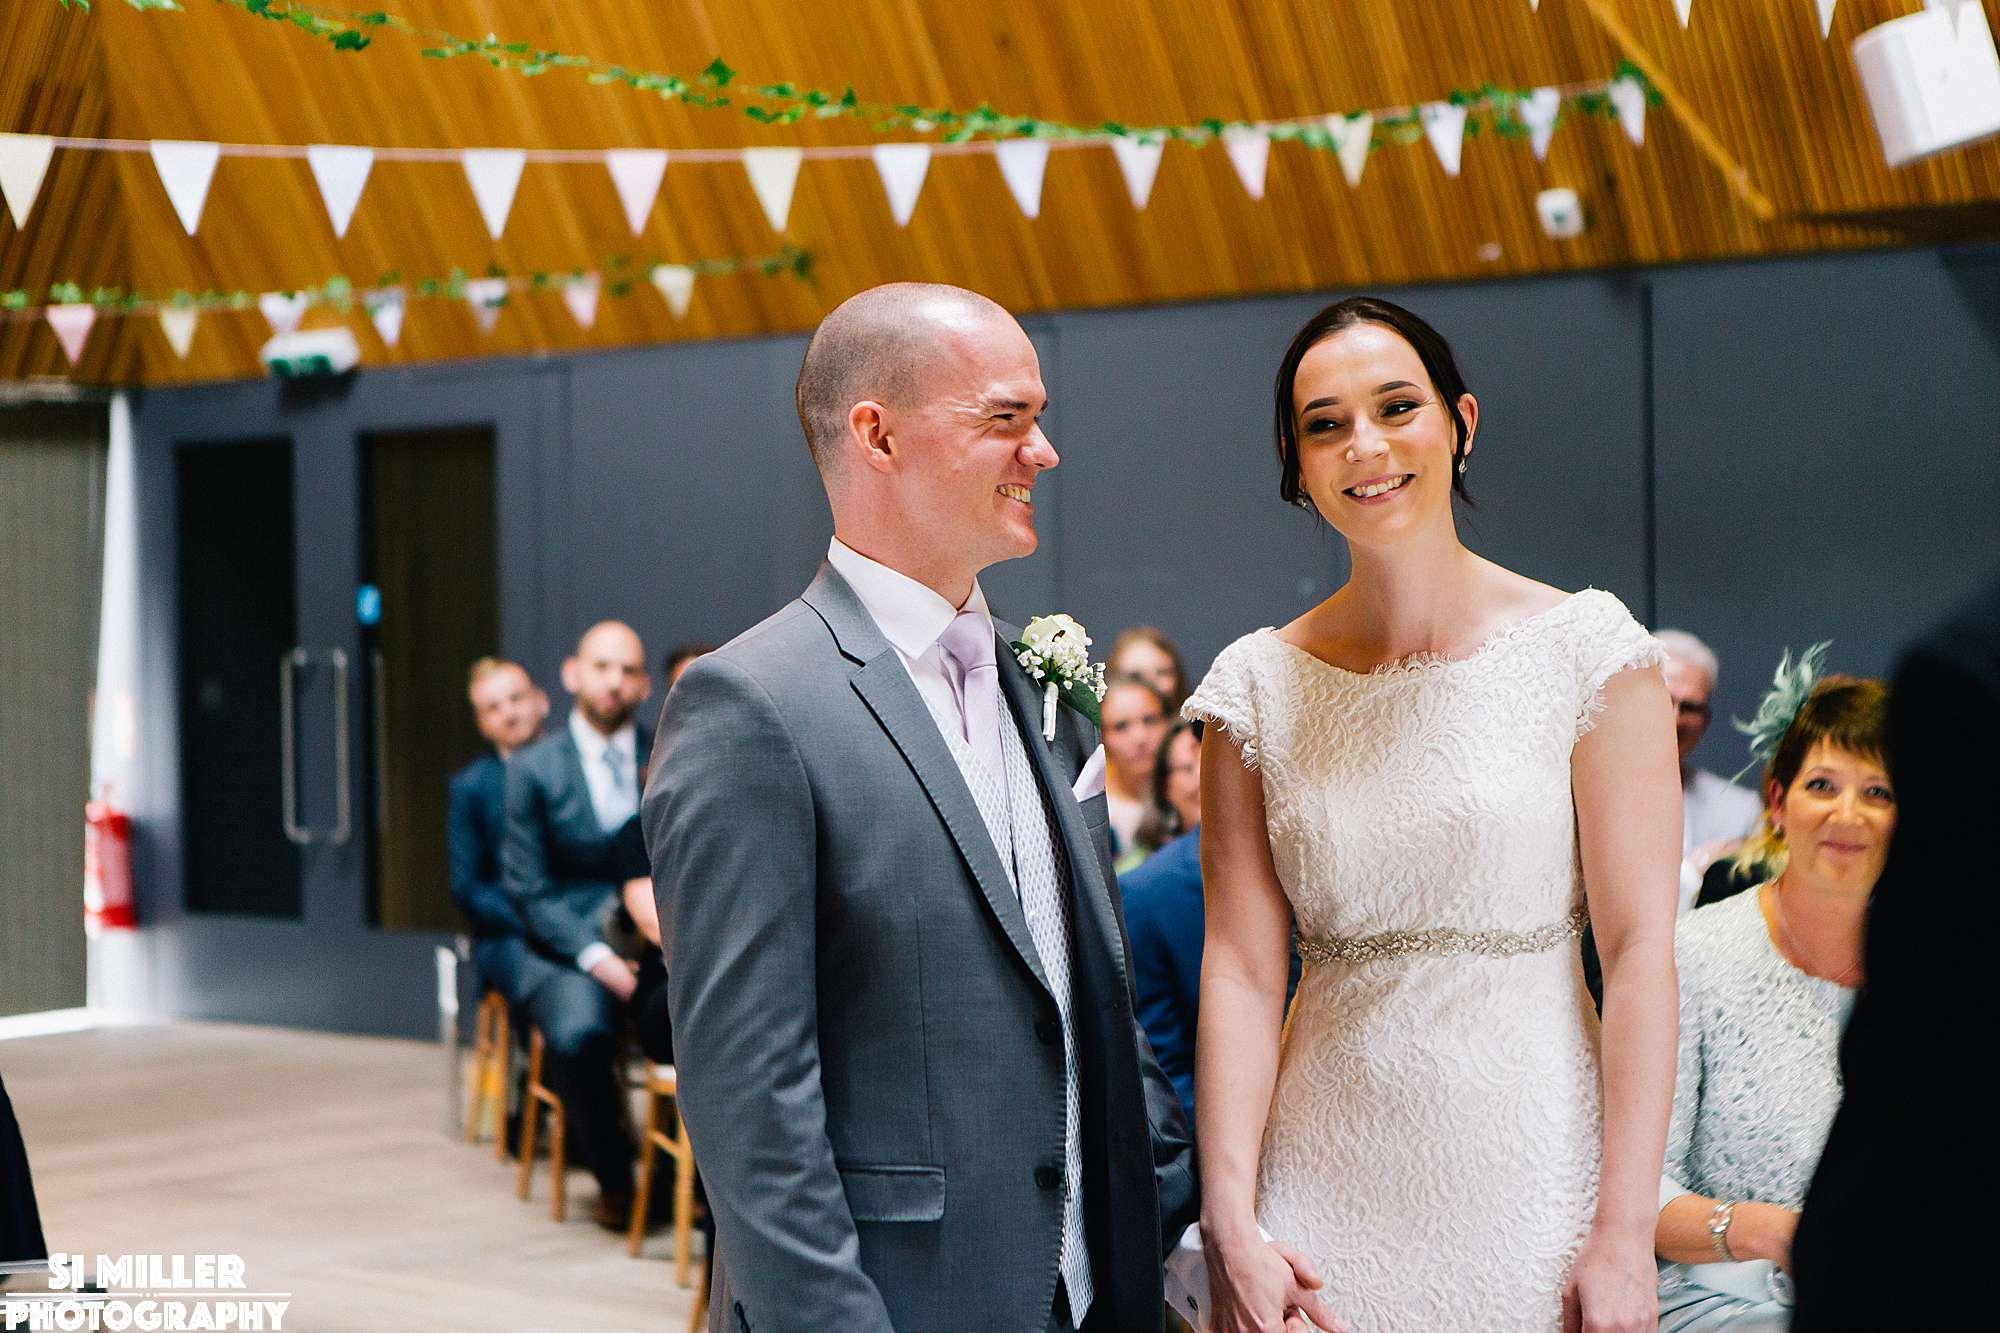 Bride and groom smiling during wedding ceremony at brockholes